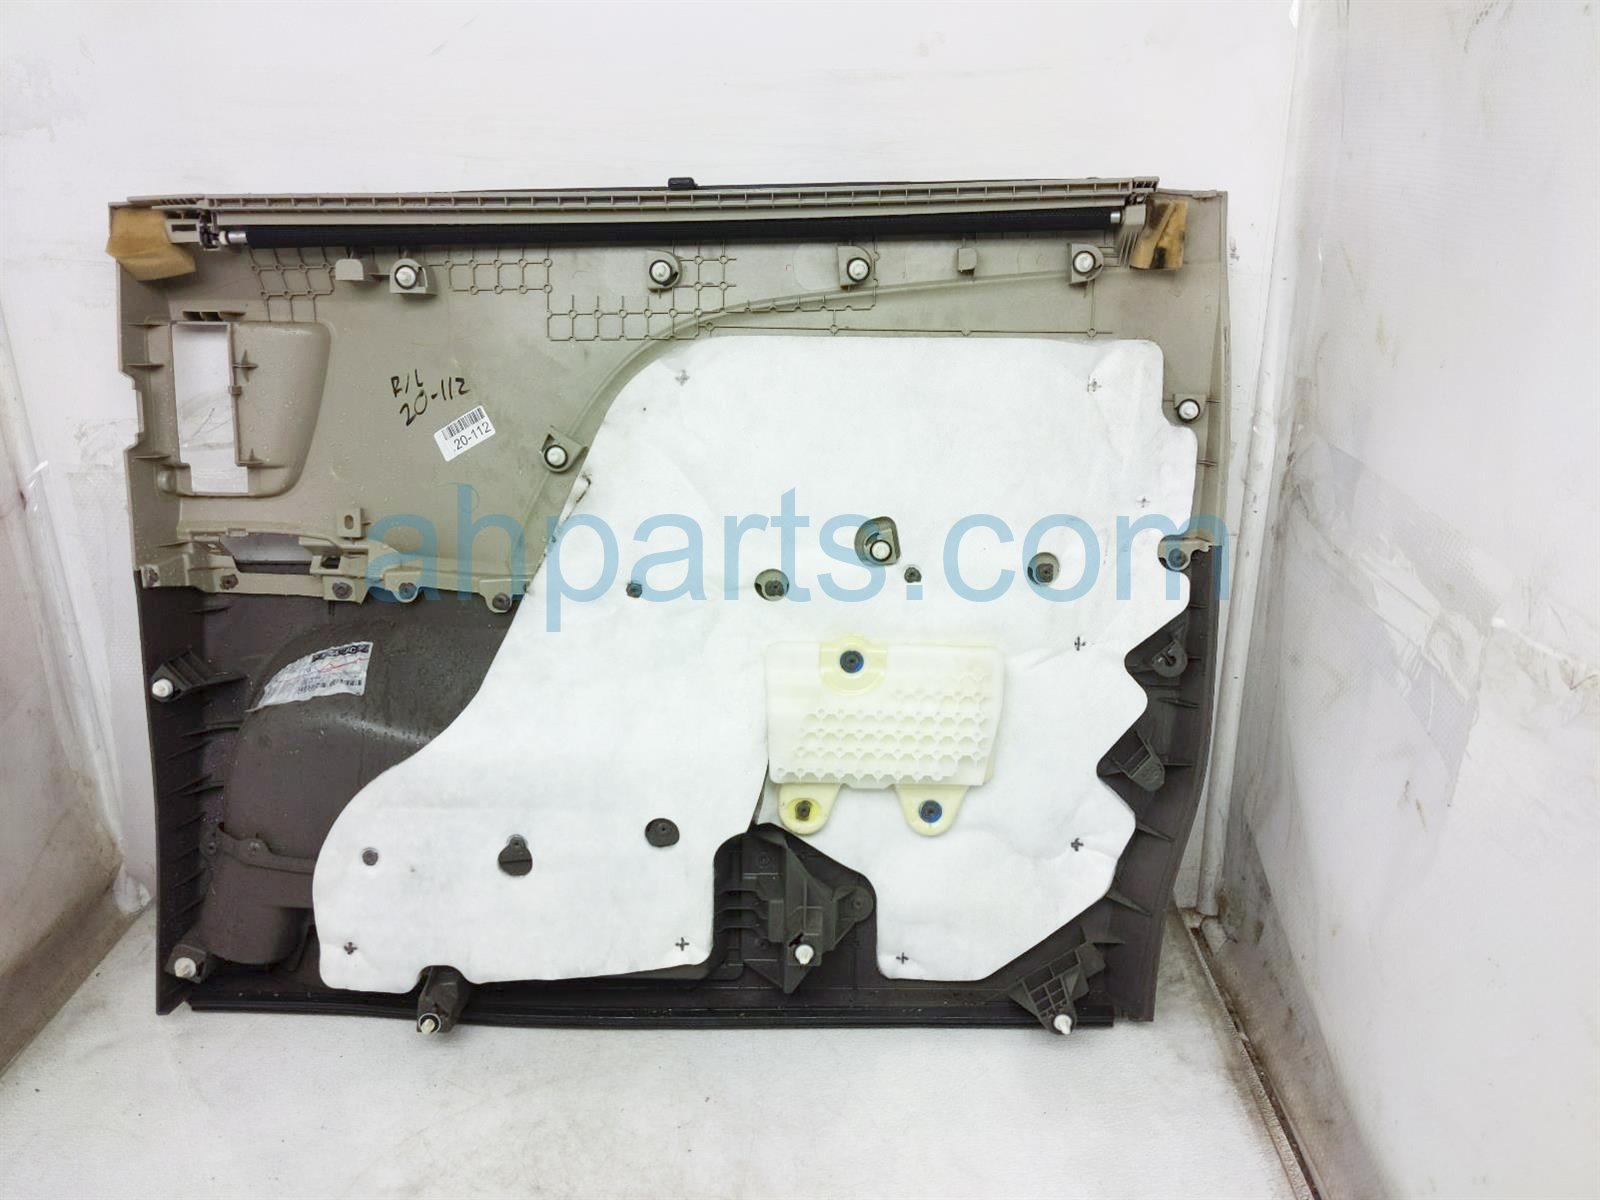 2013 Toyota Sienna Trim Liner Rear Driver Interior Door Panel   Tan/grey 67690 08201 E0 Replacement